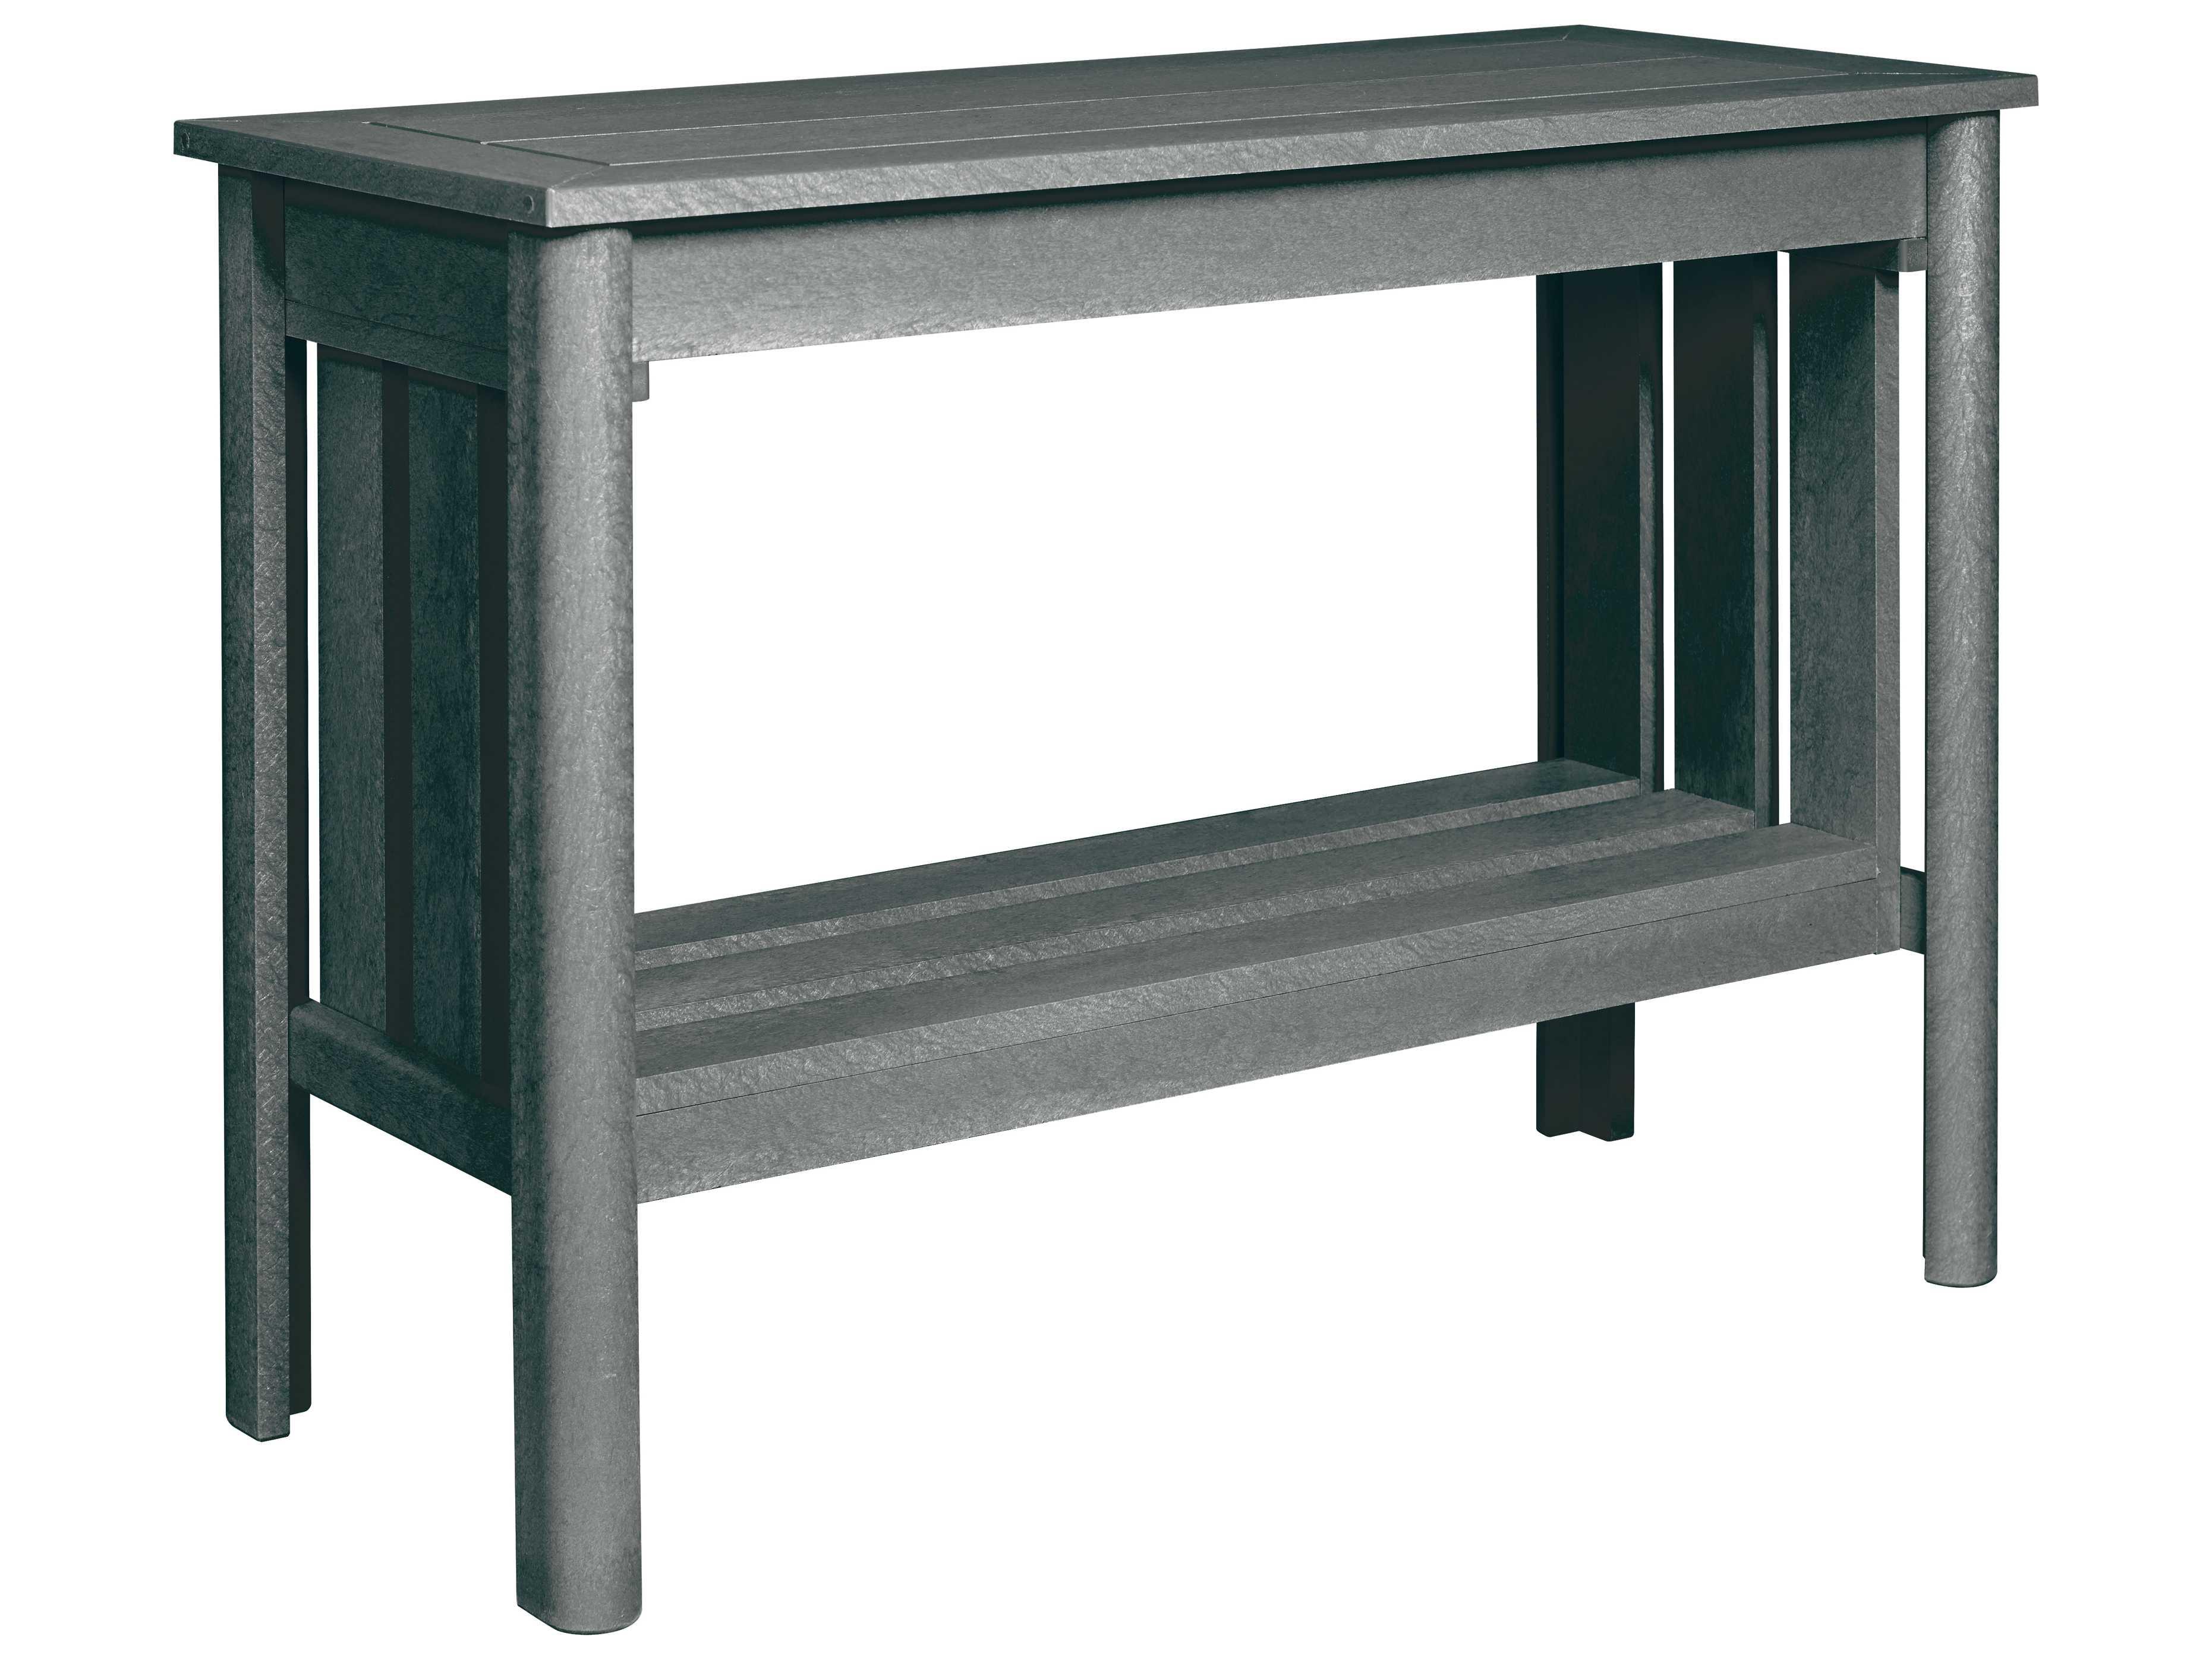 C R Plastic Stratford Recycled Plastic 44 x 19 Sofa Table